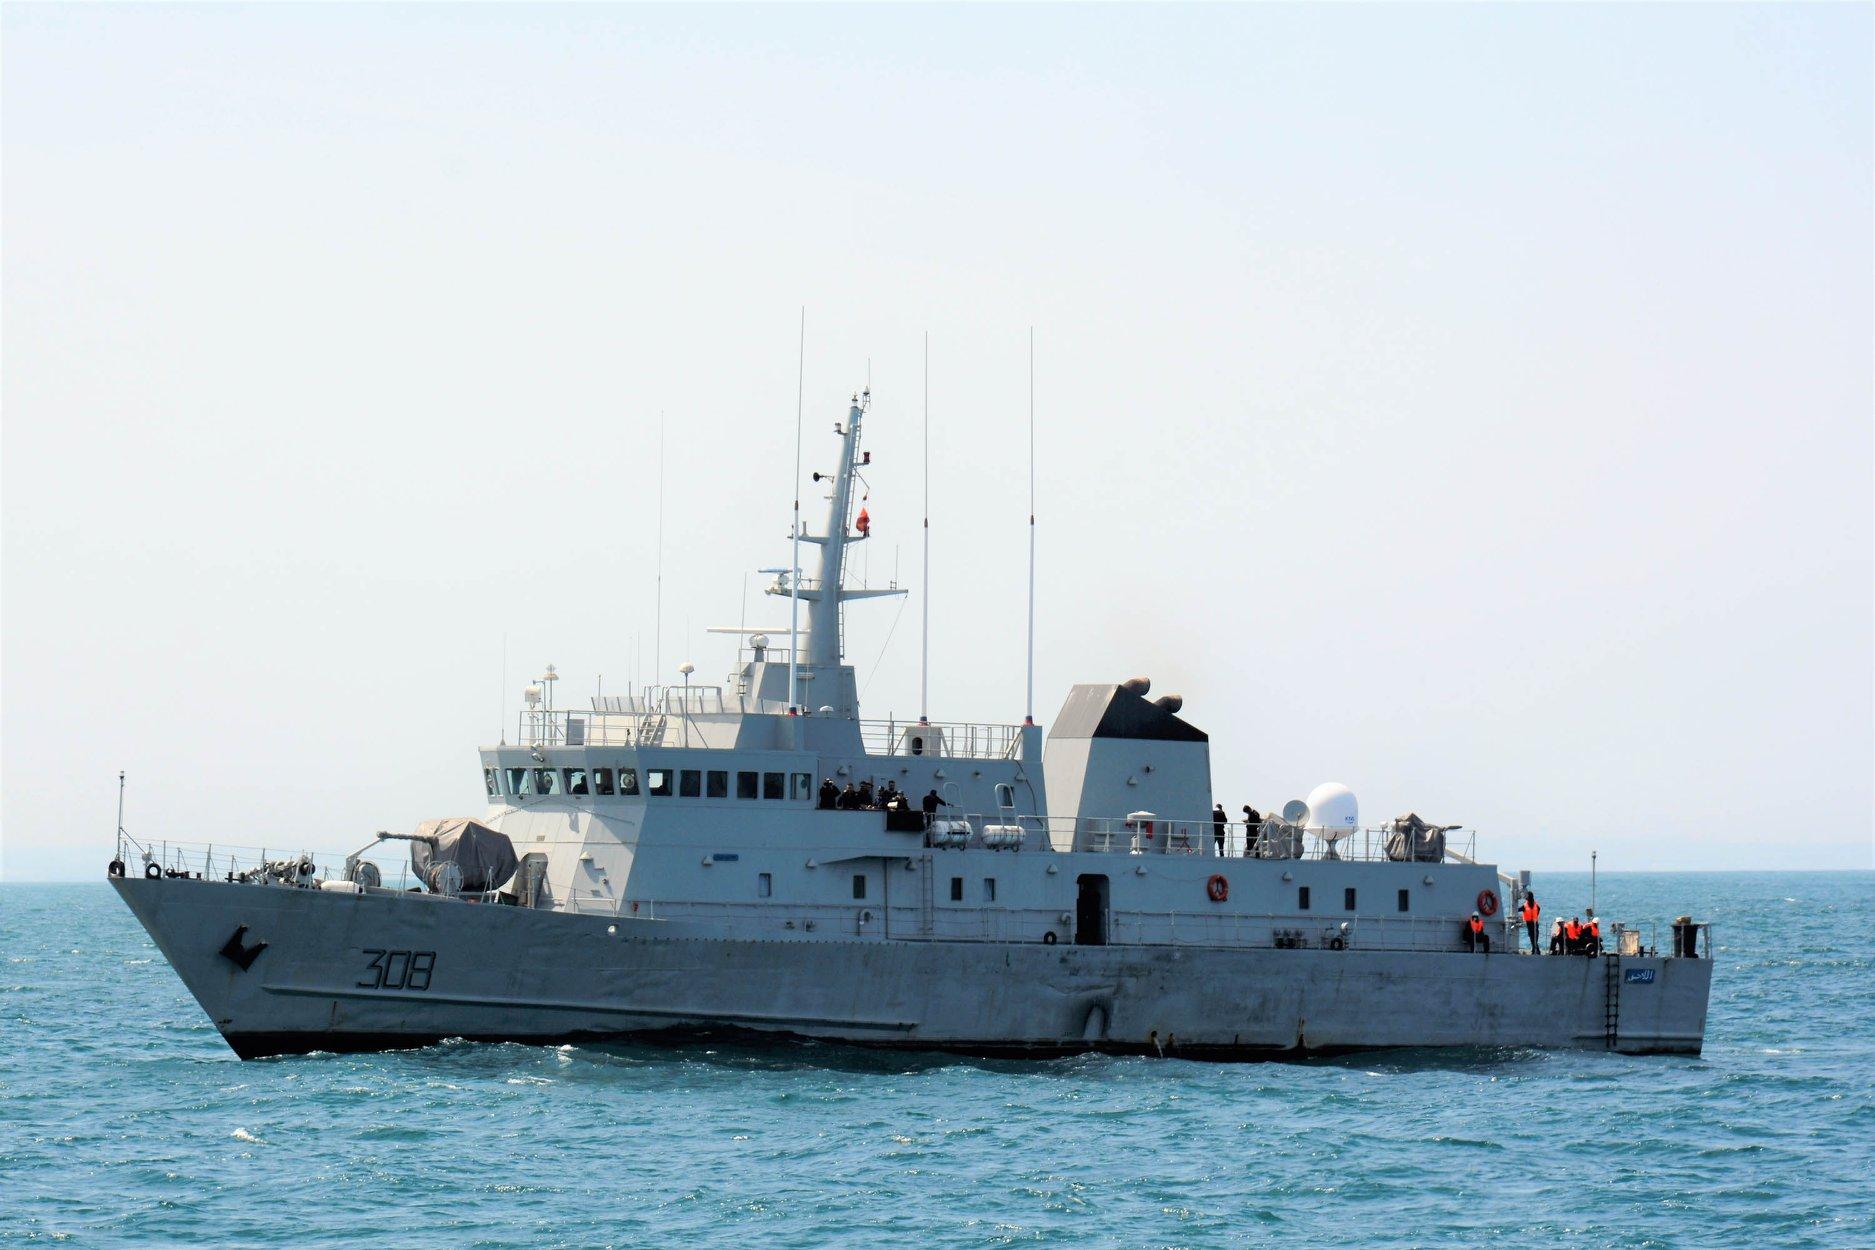 SNMCMG2 - RMN El Lahiq 57174910